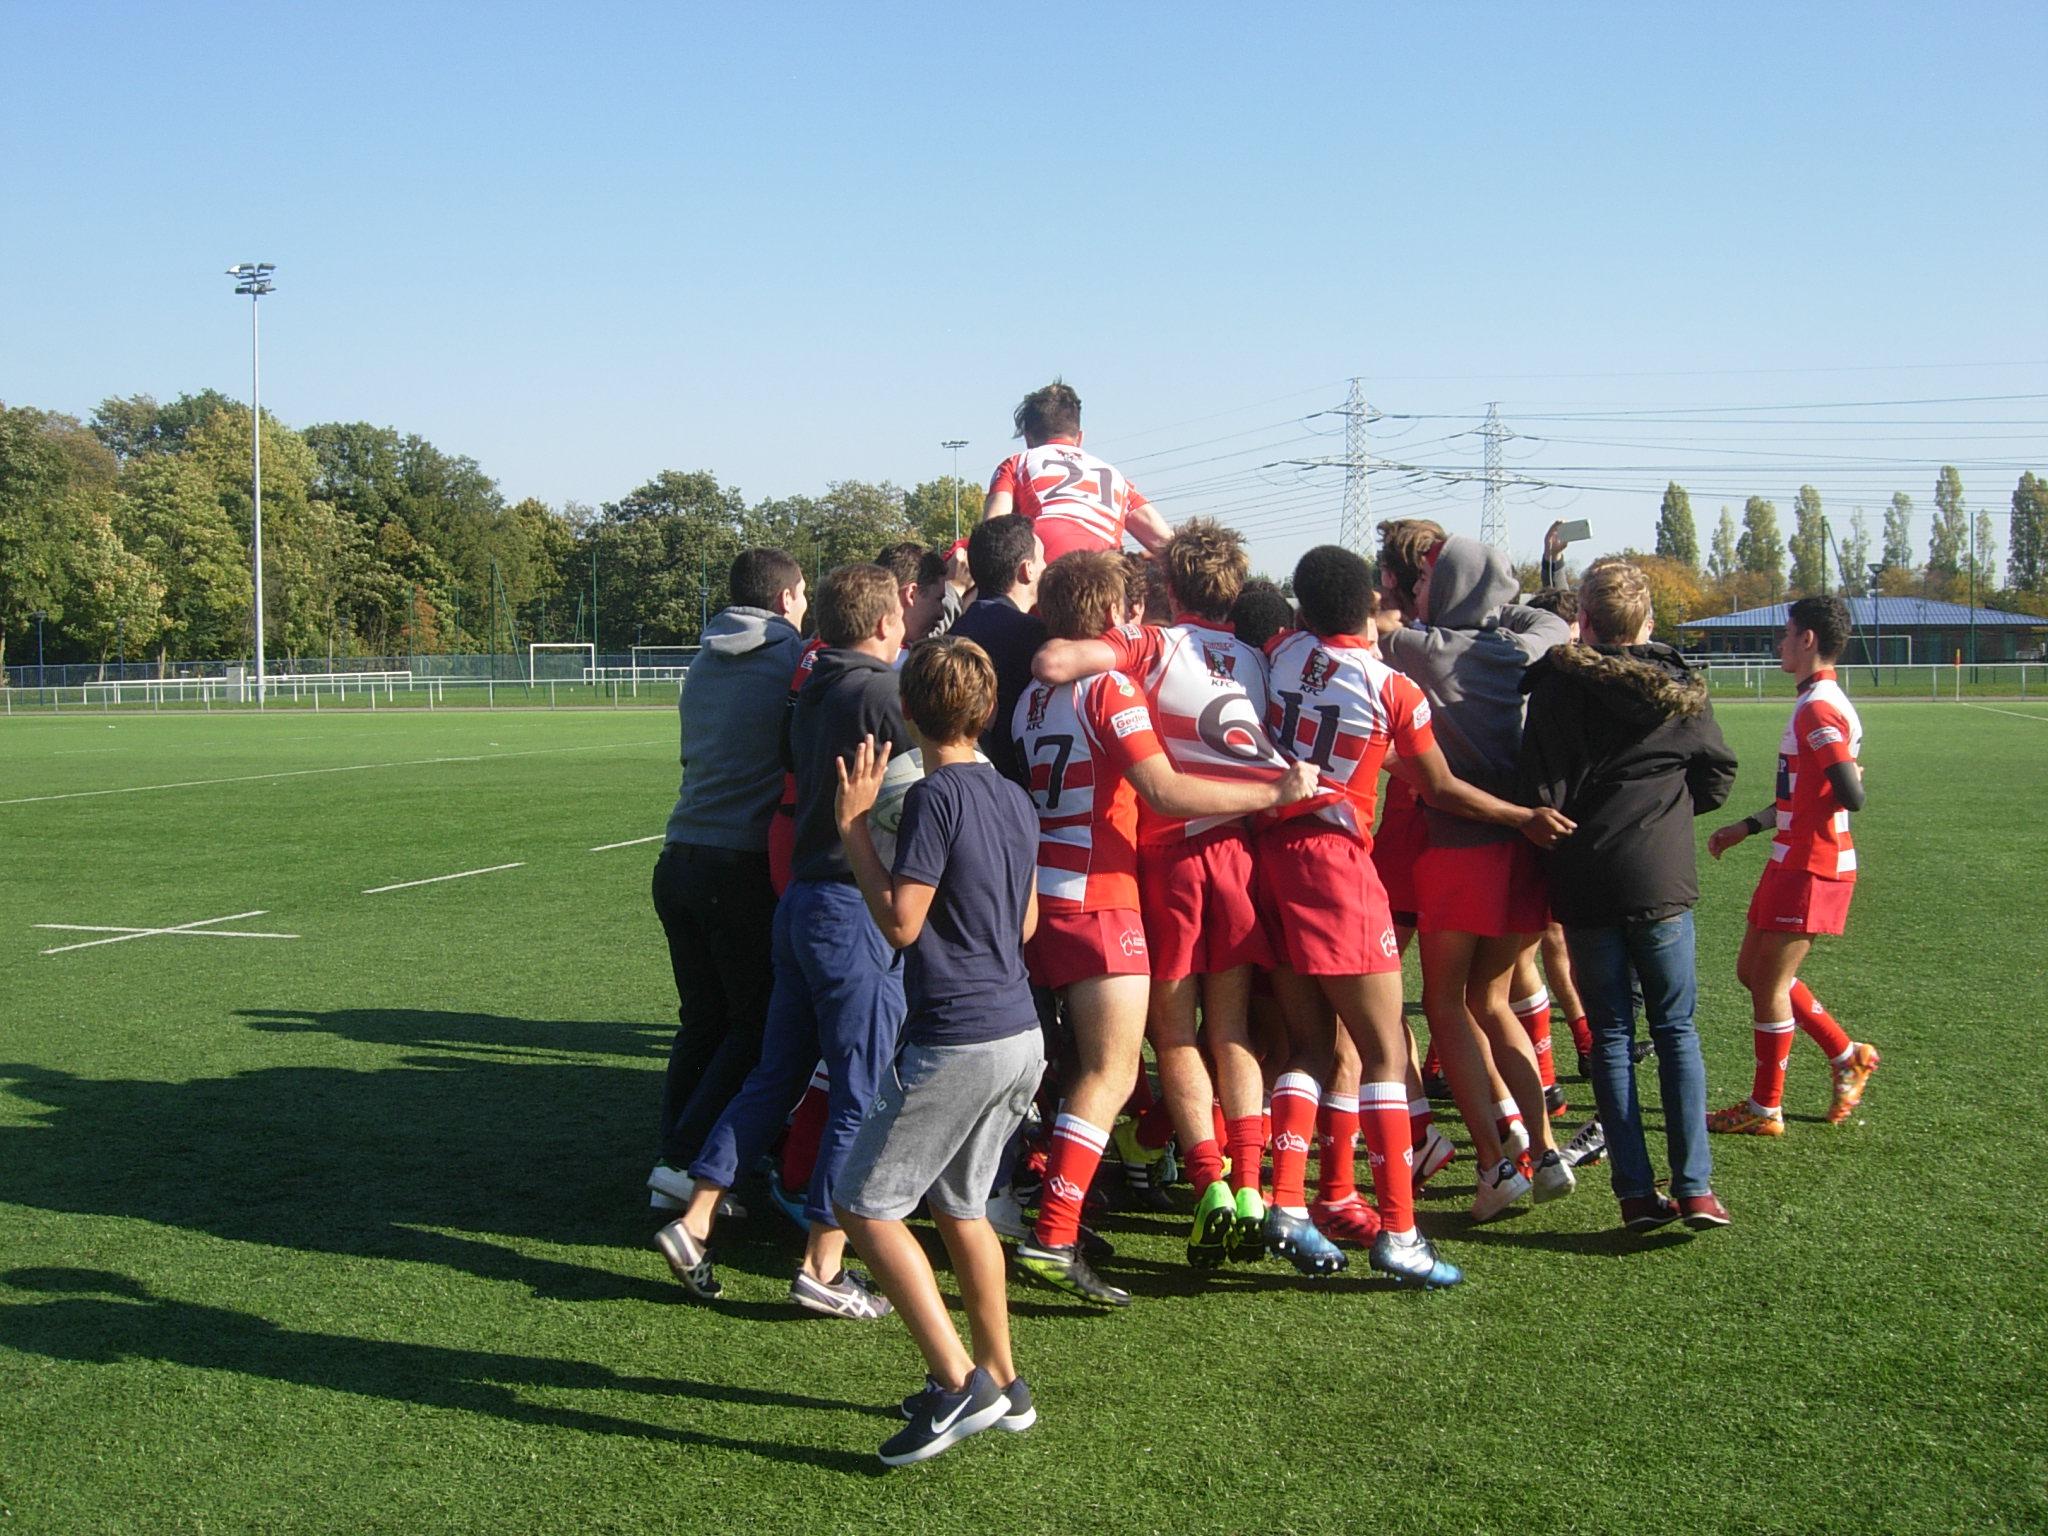 Clamart Rugby 92 - Qualification des juniors